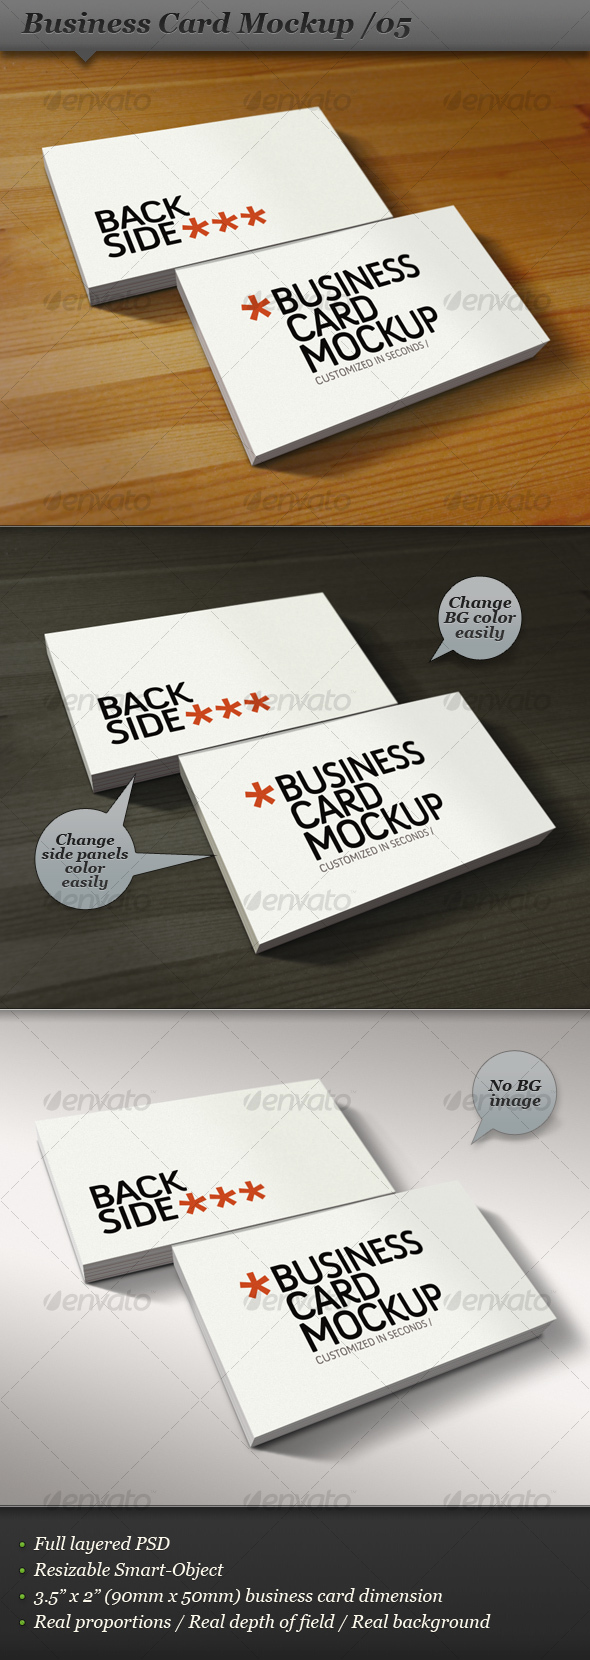 Business card mockup display smart template 05 for Business card display template